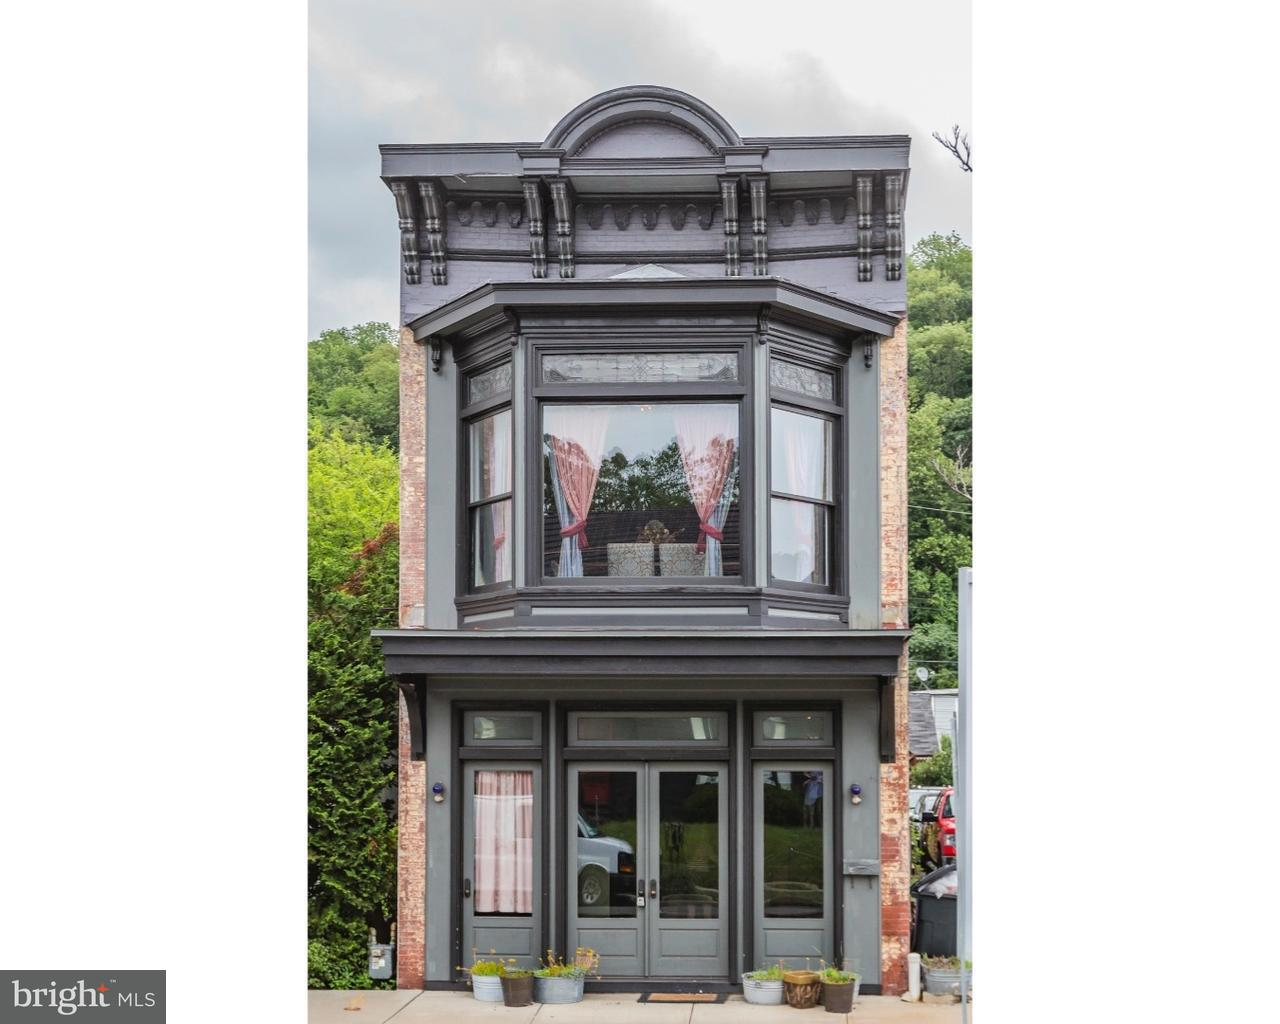 Single Family Home for Sale at 12 N MAIN Street Lambertville, New Jersey 08530 United StatesMunicipality: Lambertville